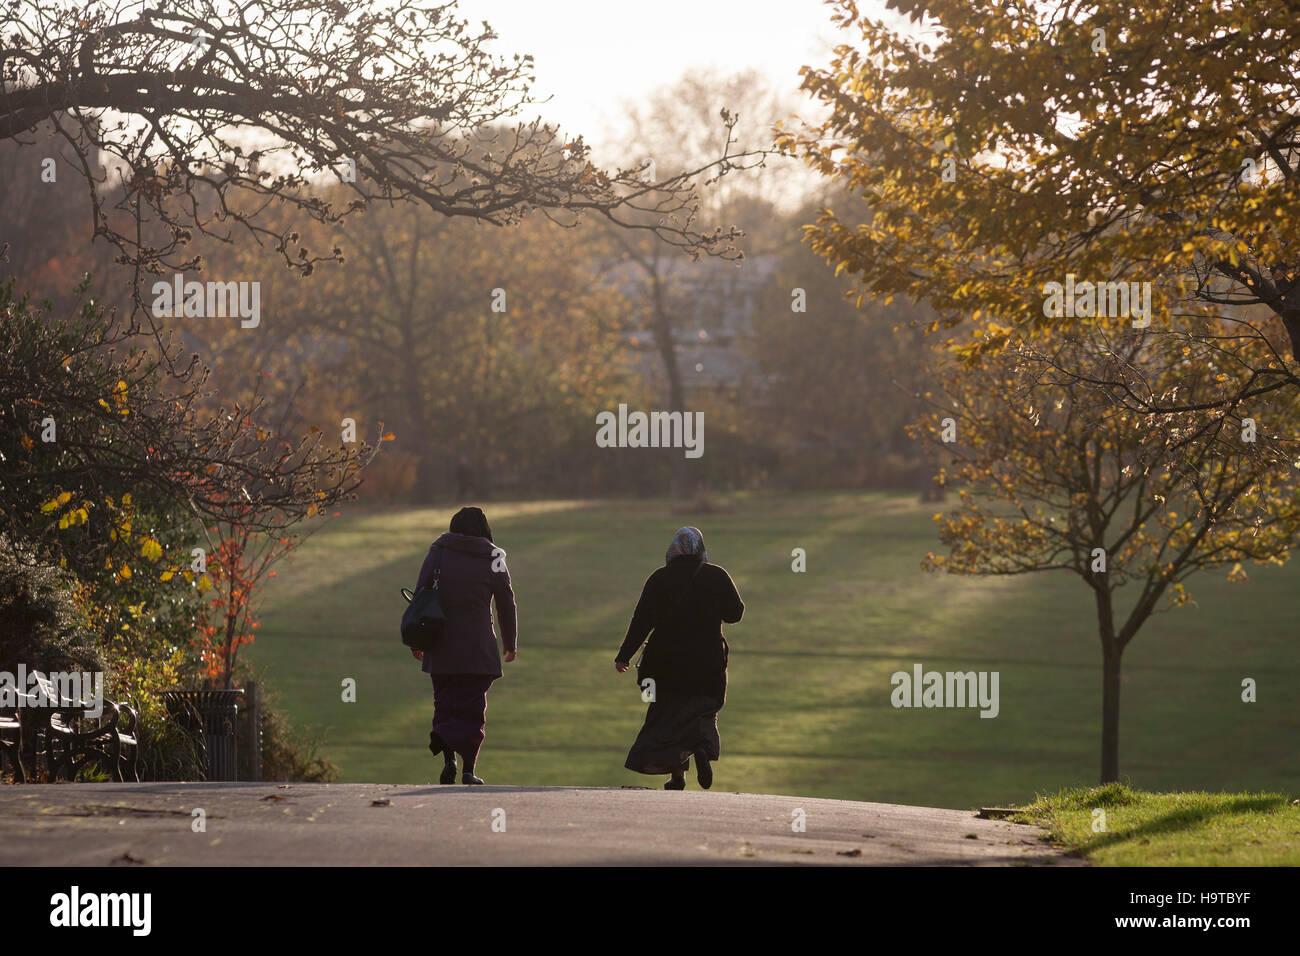 Two Muslim women walk through Brockwell Park in Herne Hill, Lambeth SE24 south London. - Stock Image